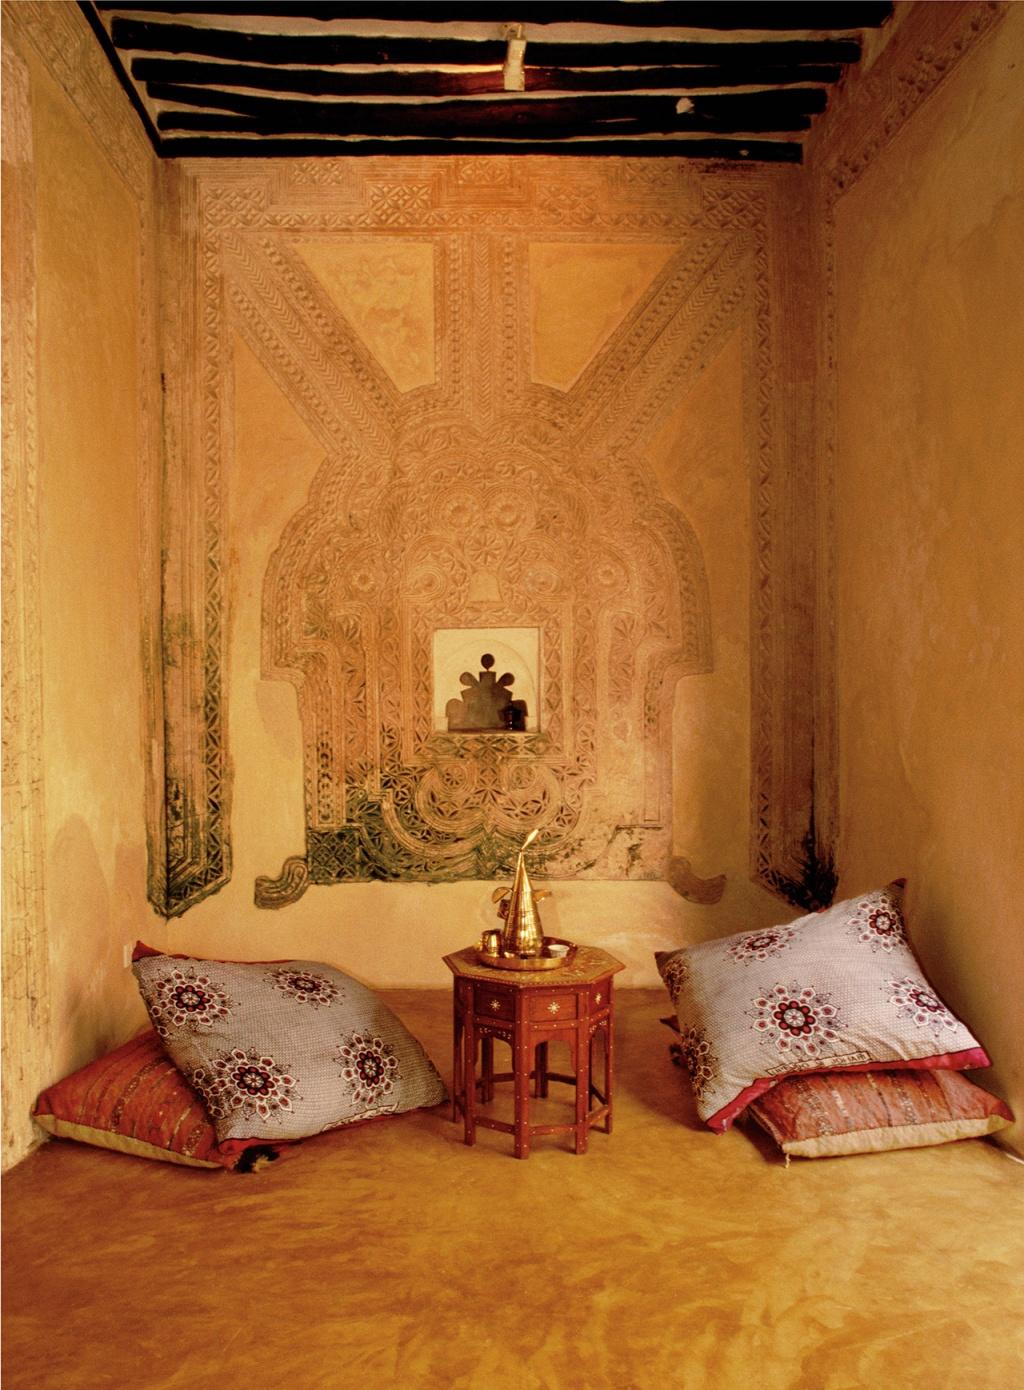 Old meditation room